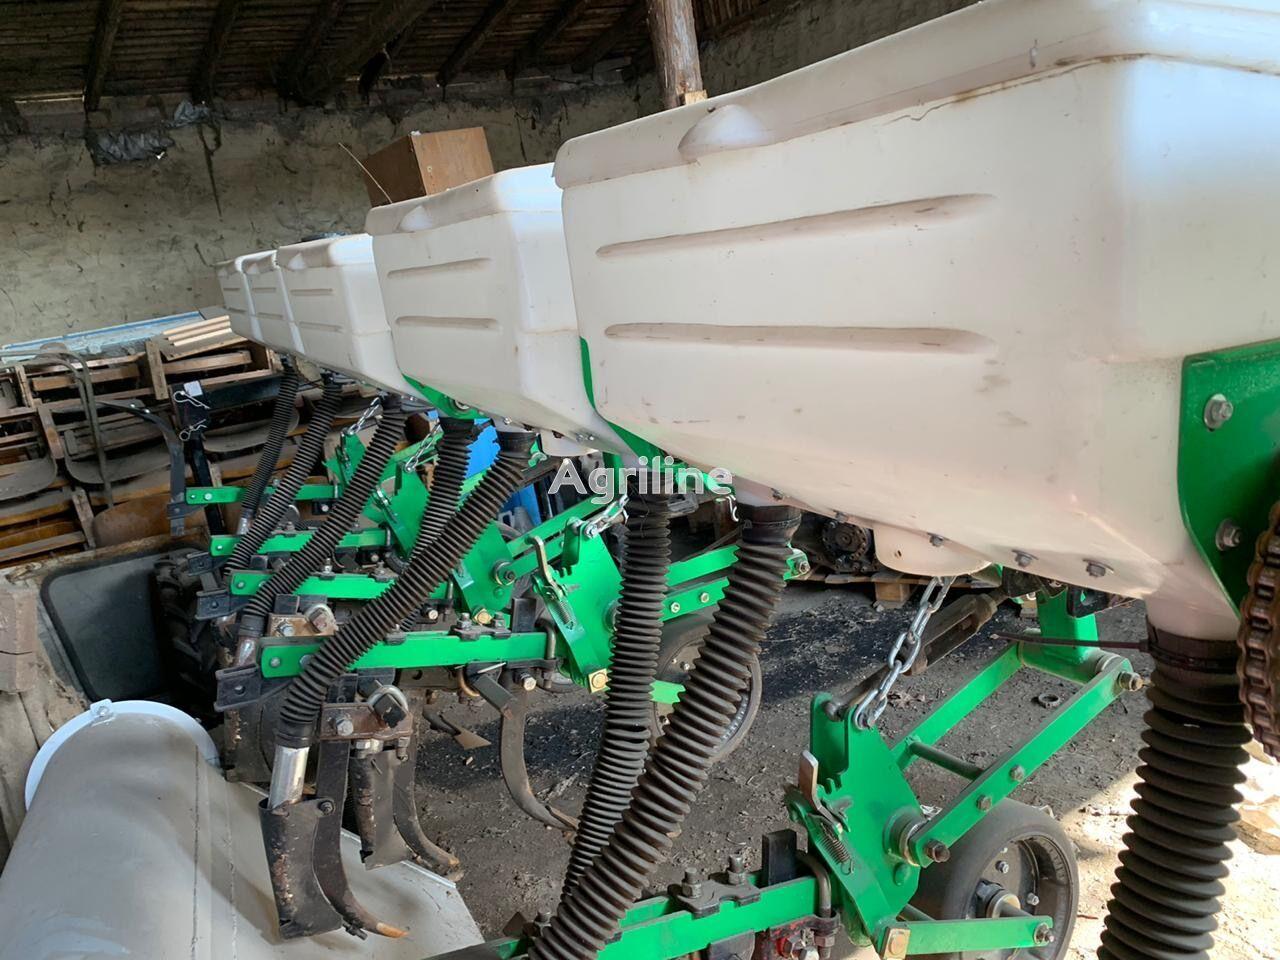 GASPARDO ORIGIN ROOT 4,2-06S cultivator